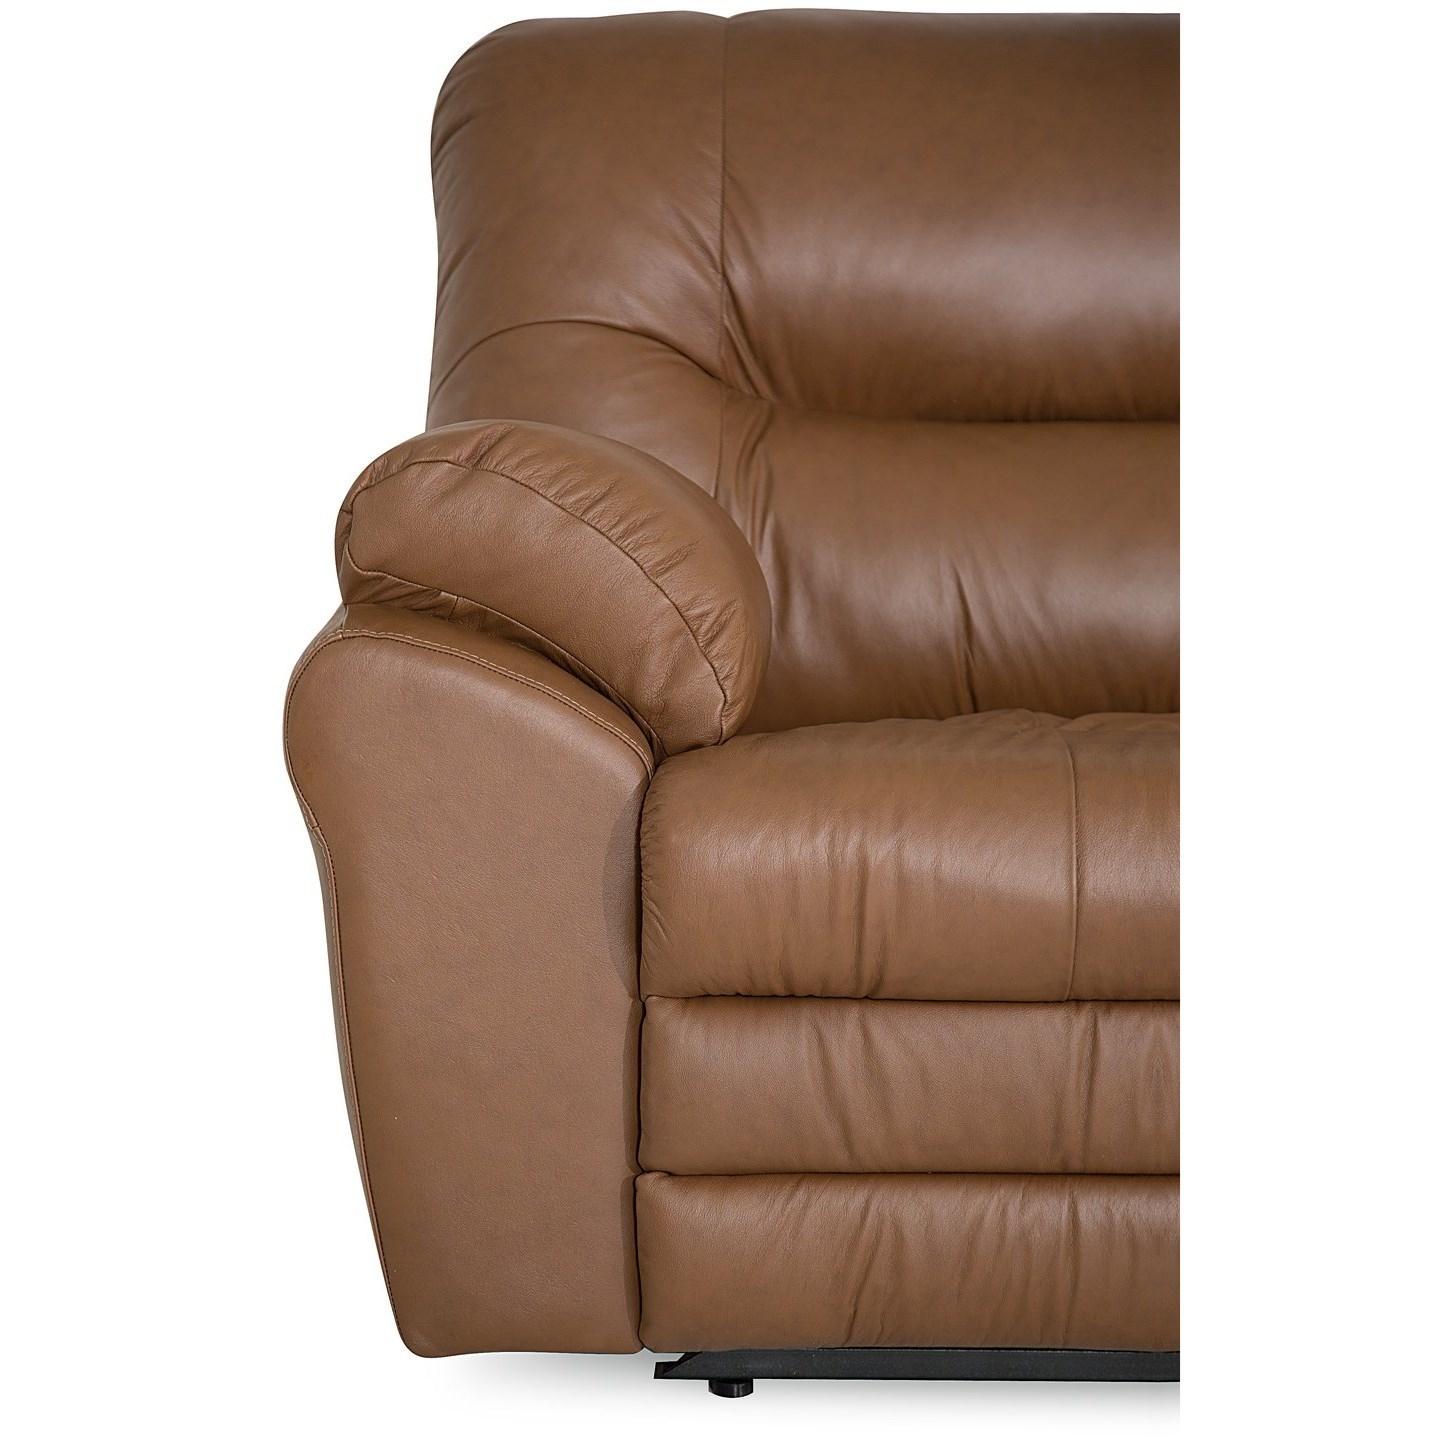 Palliser Divo Casual Reclining Sofa A1 Furniture